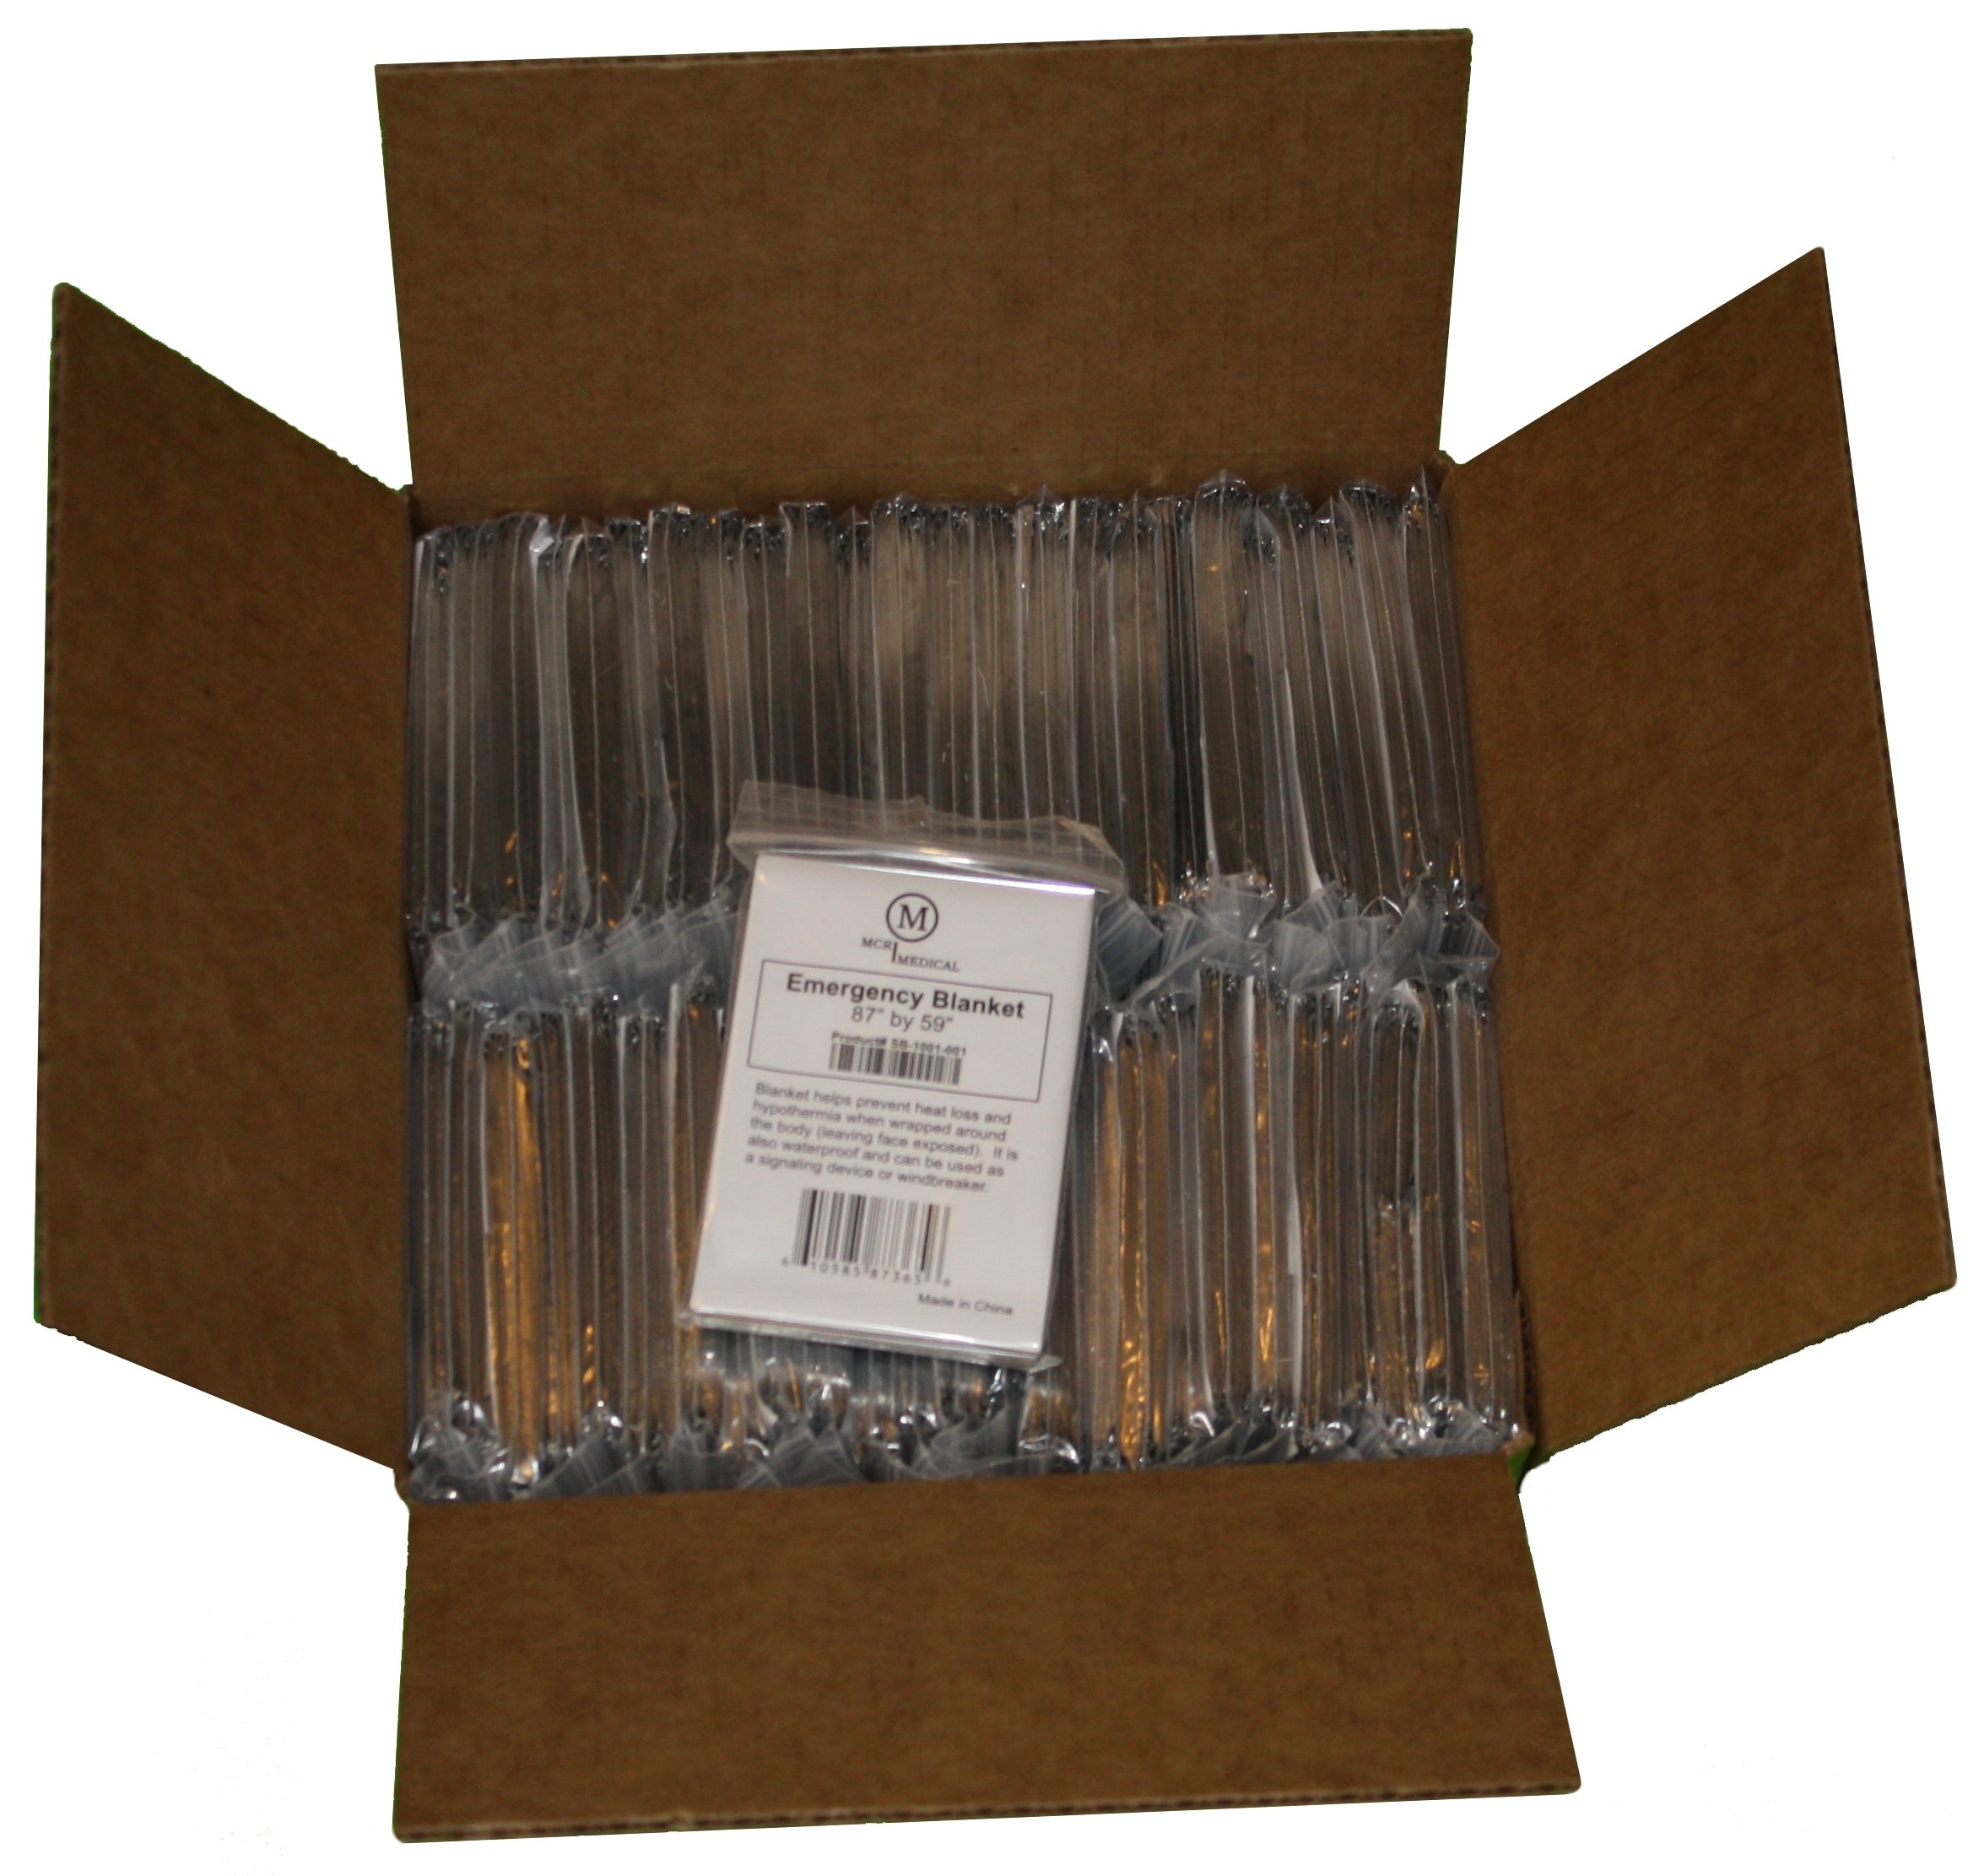 "Box of 100 Silver Emergency Blankets, 87"" by 59"", MCR Medical Supply"